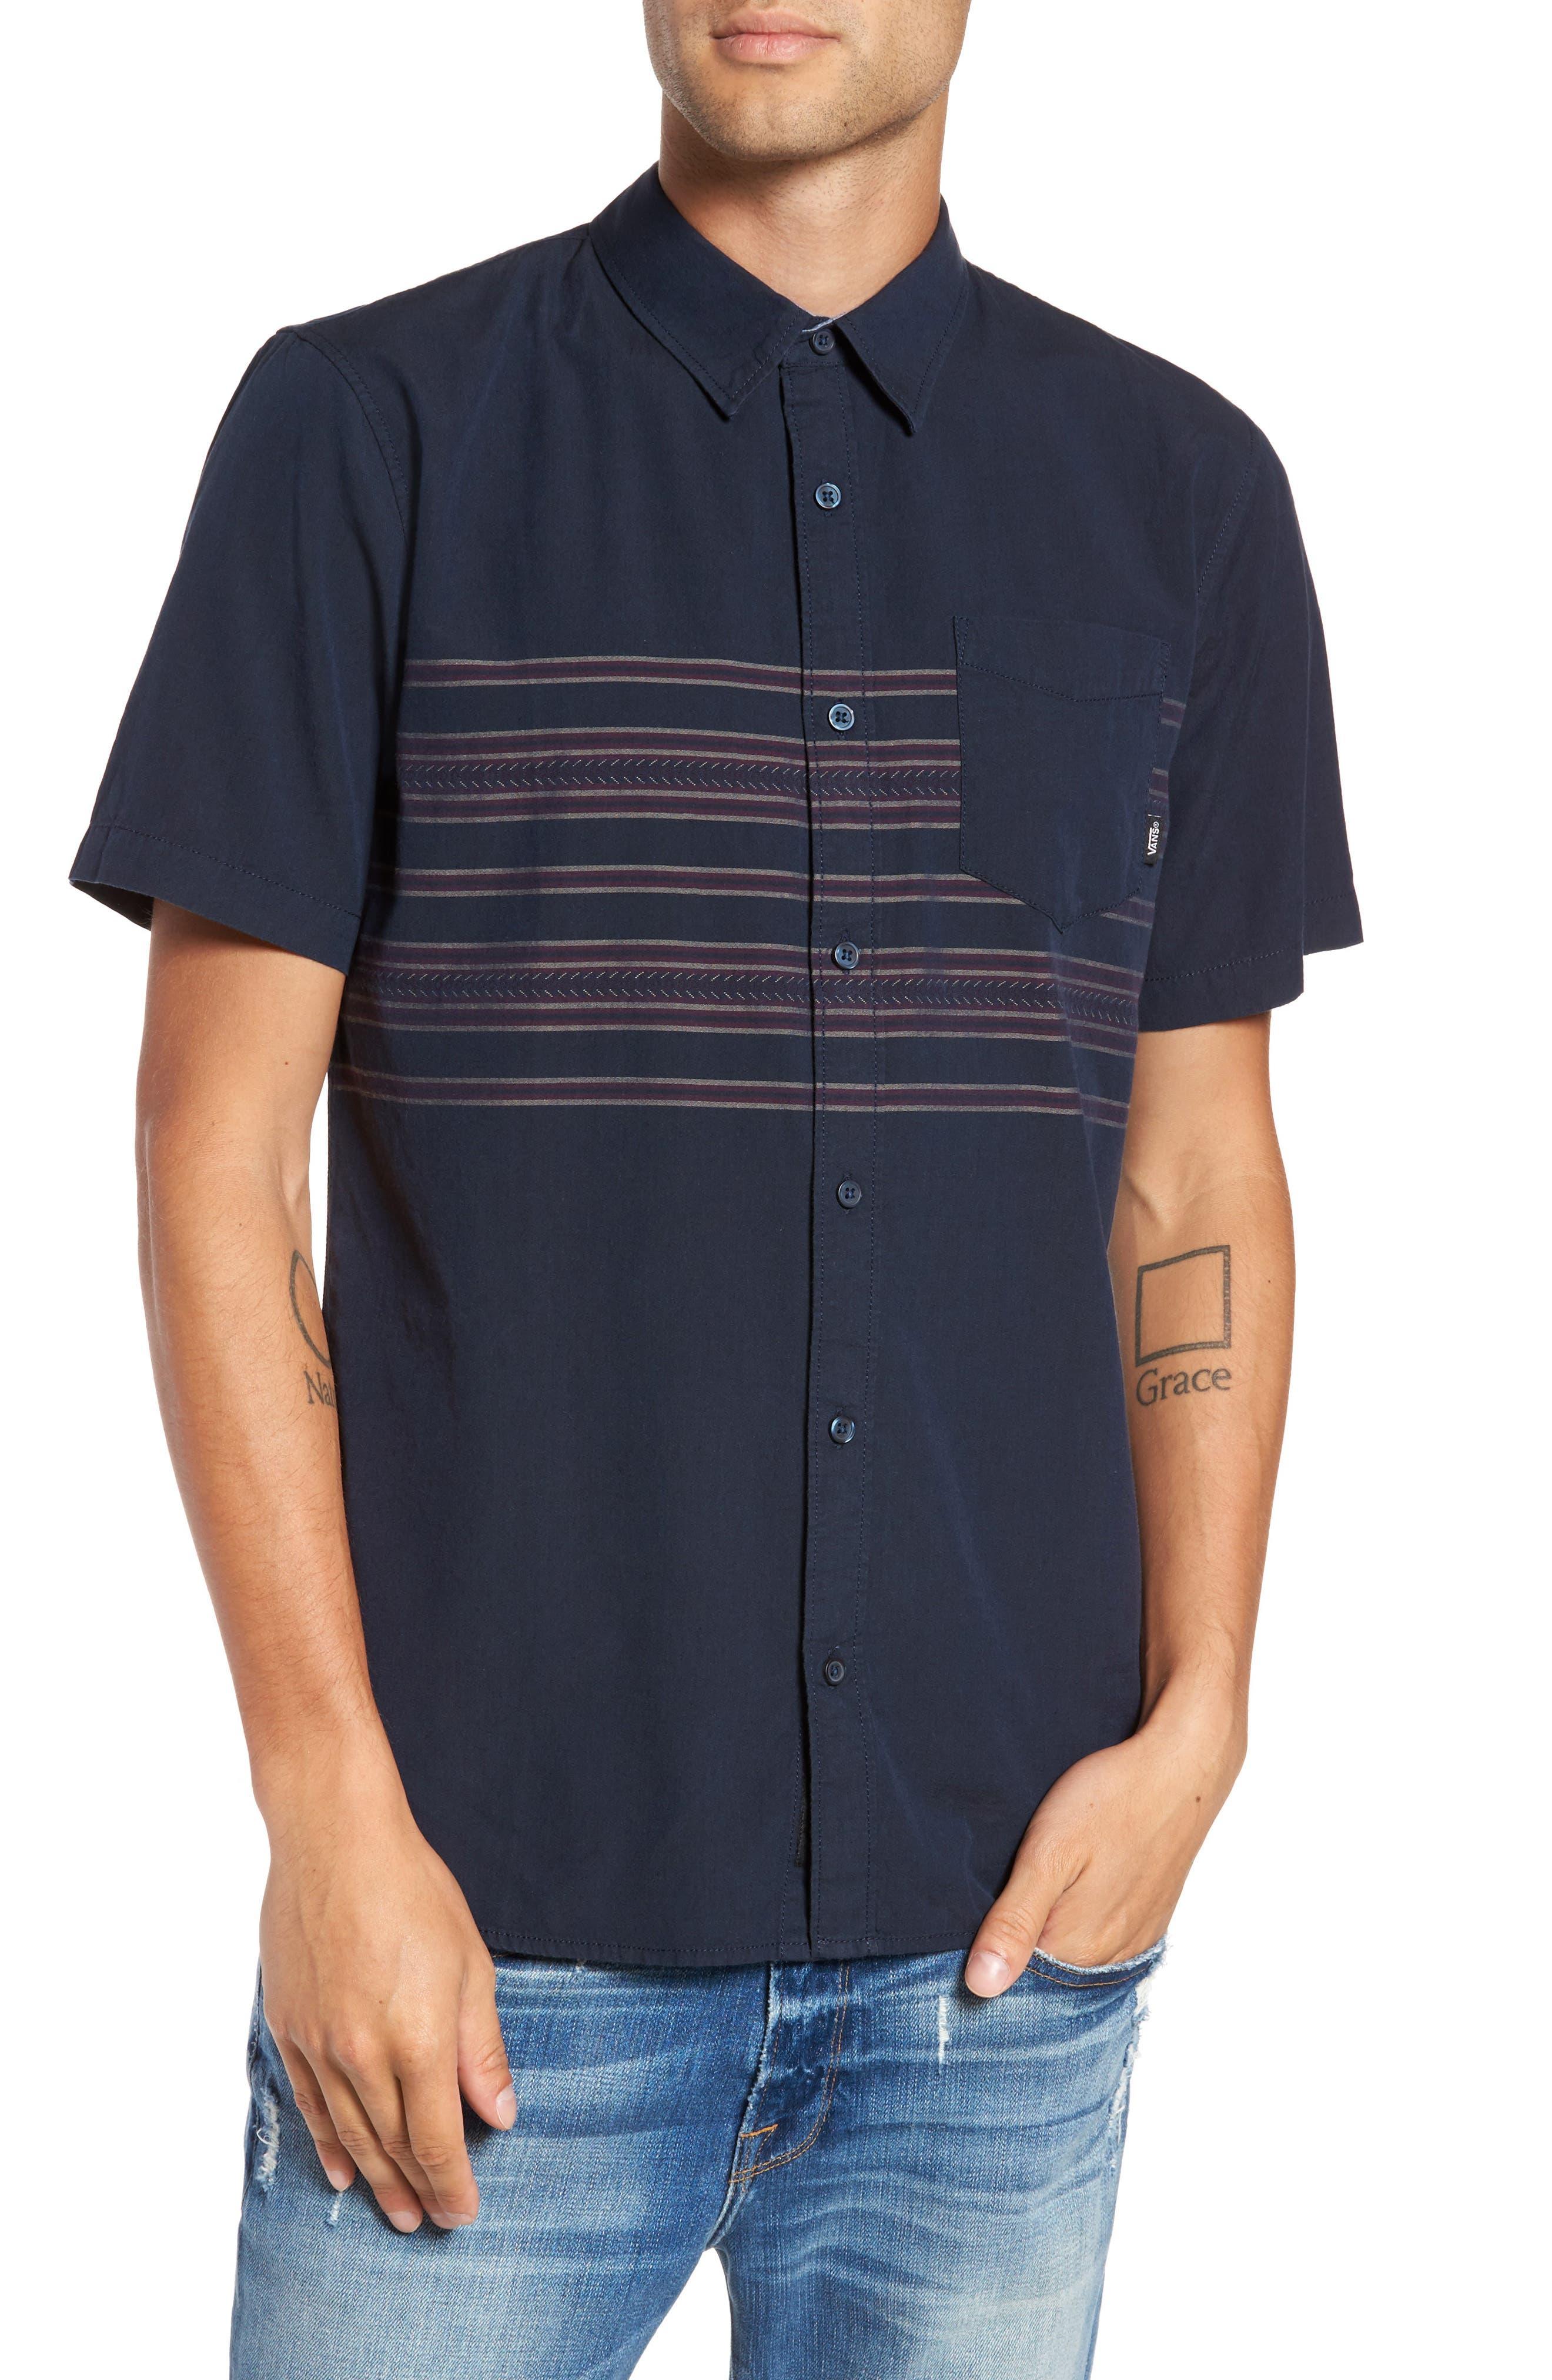 Main Image - Vans Benmore Striped Woven Shirt